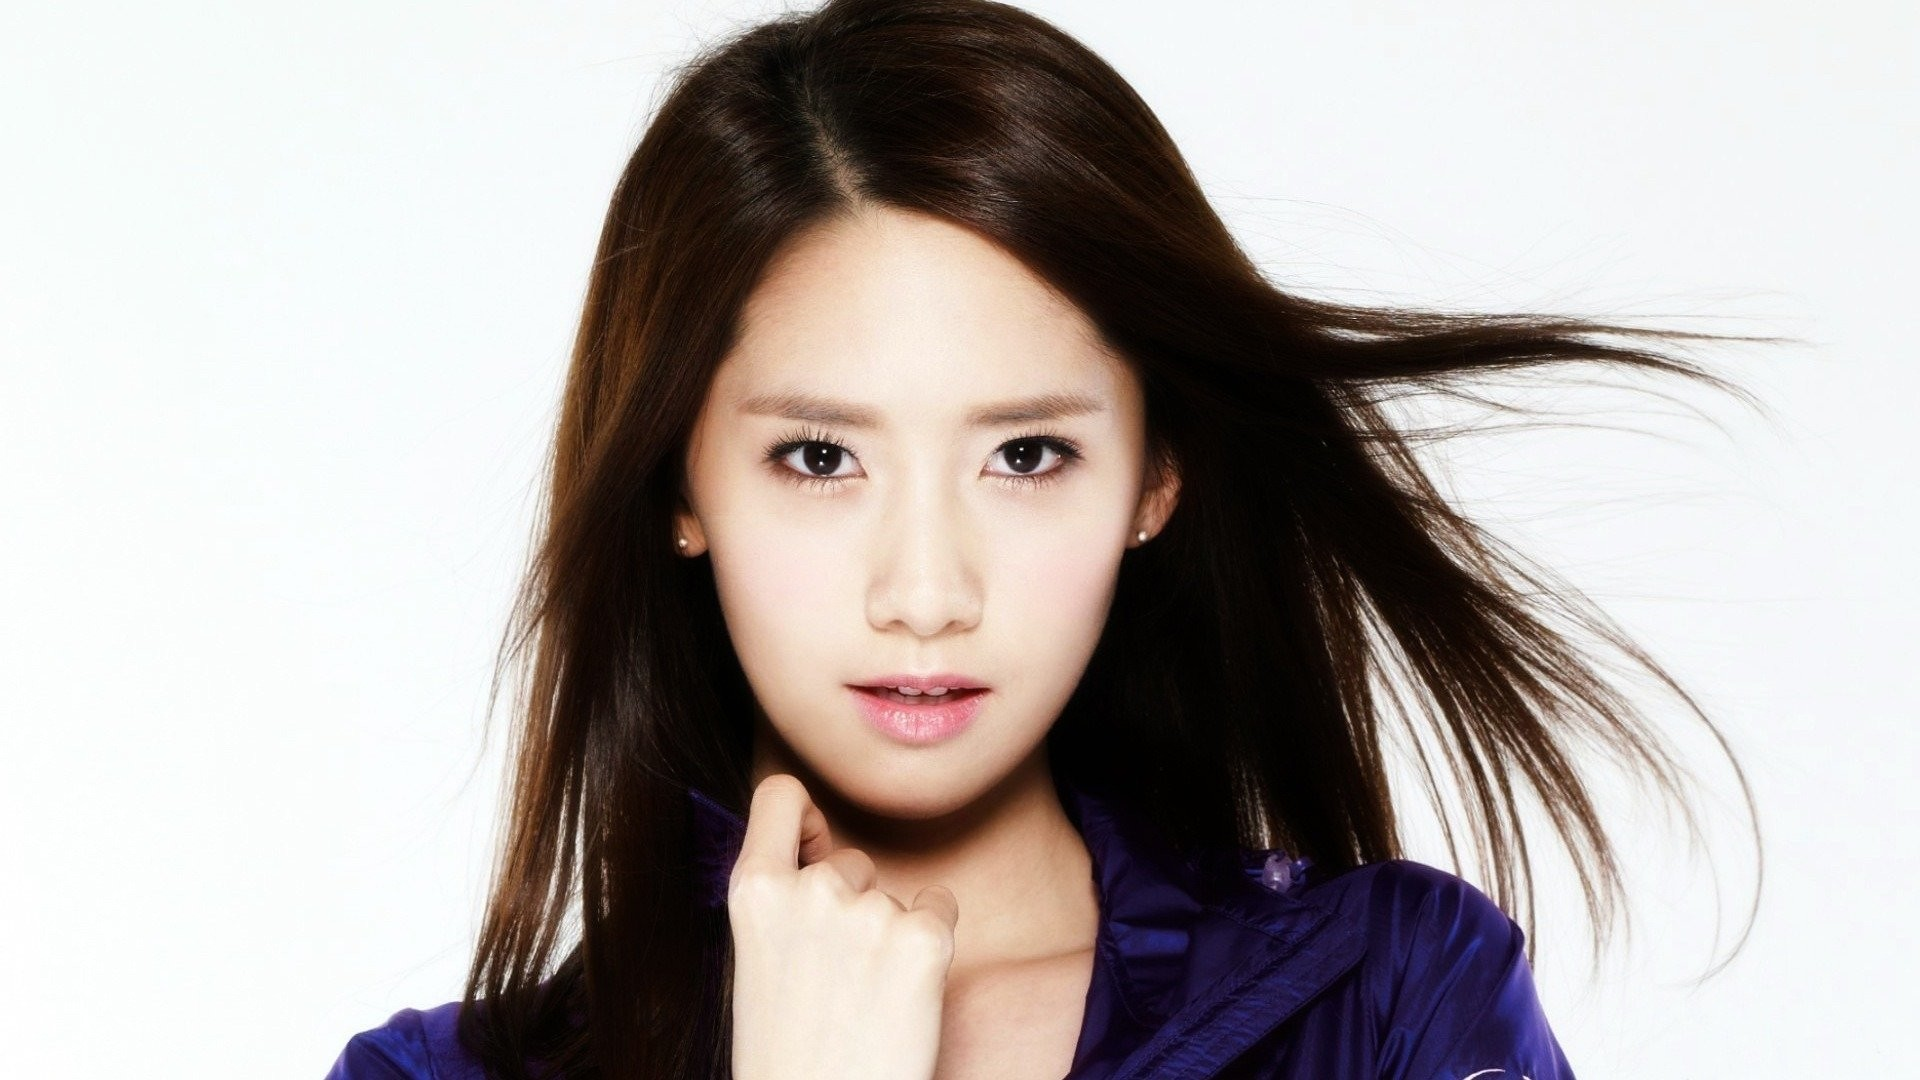 Yoona HD Wallpaper (74+ images)